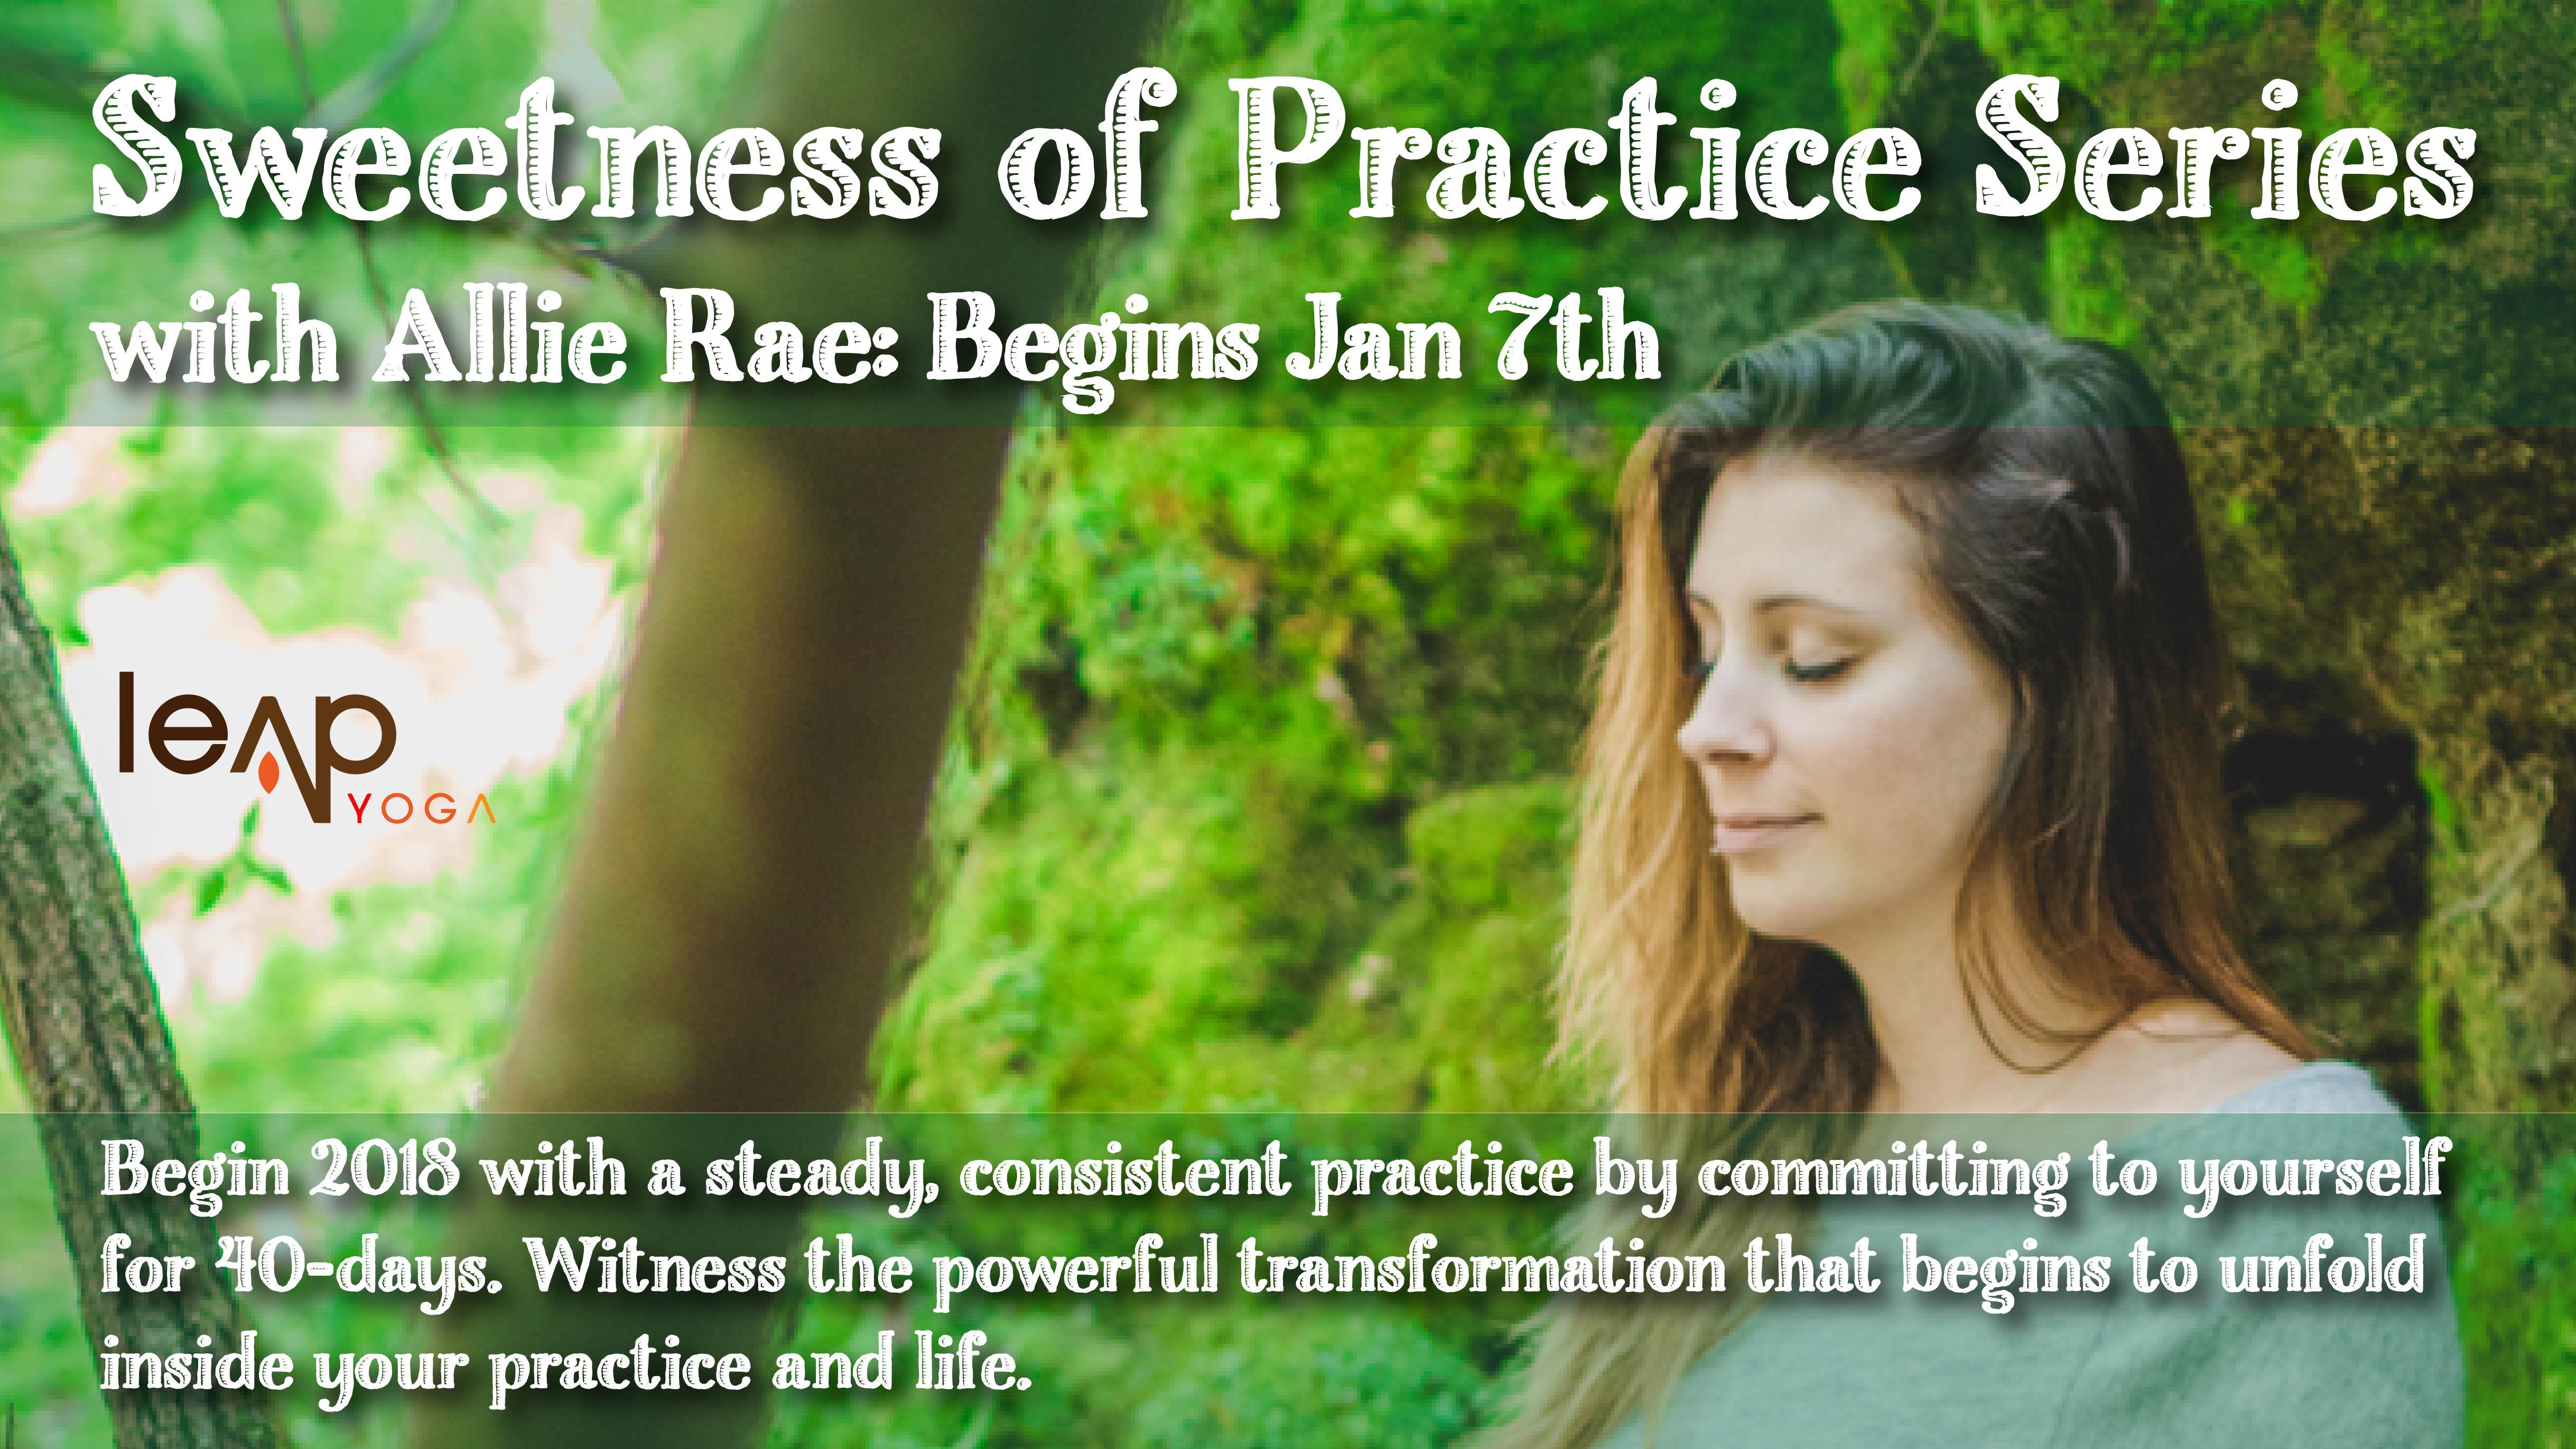 Allie Rae sweetness of practice series with allie rae | leap yoga